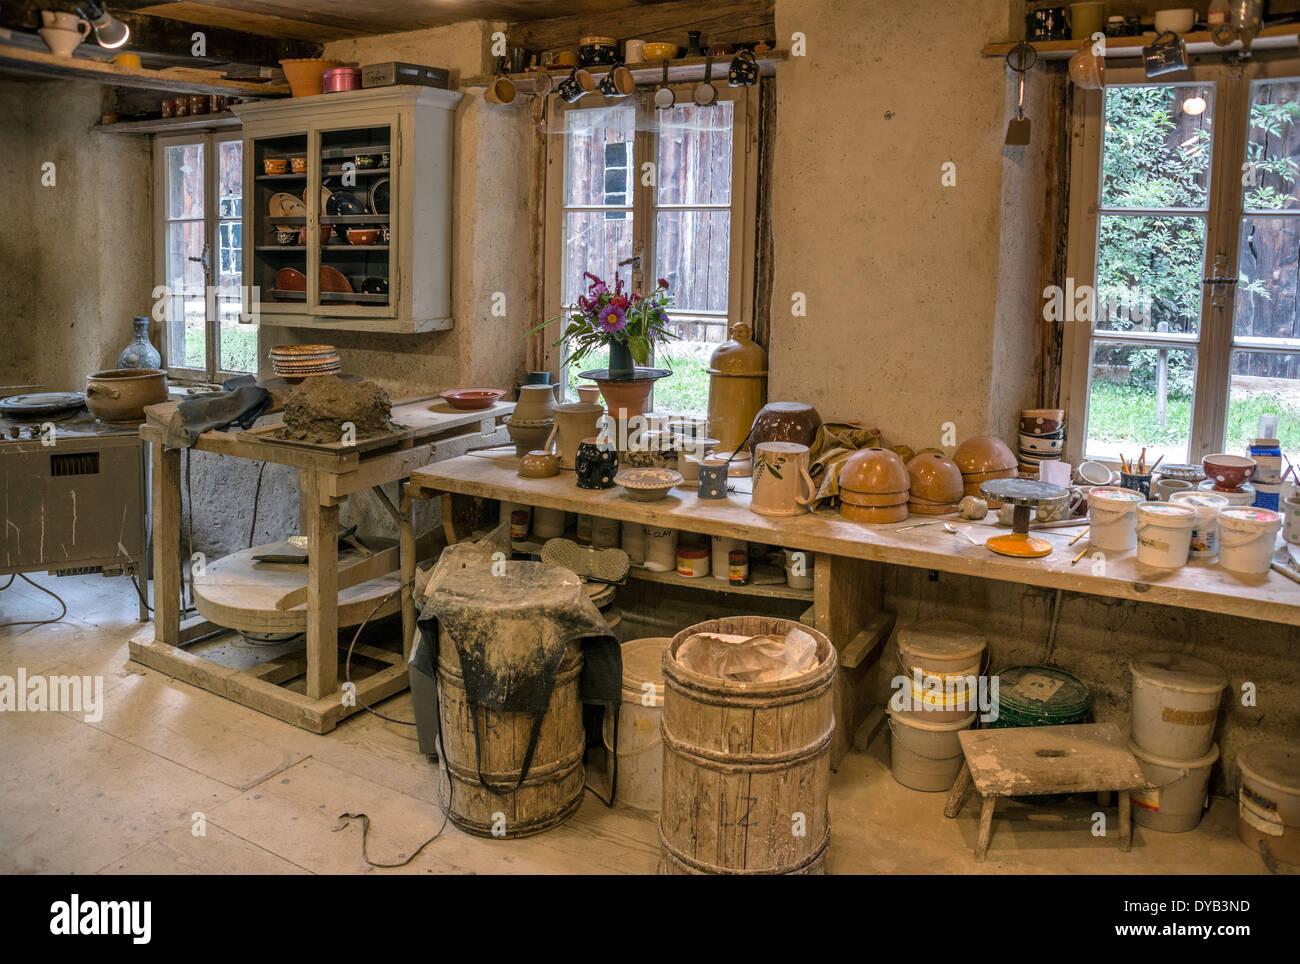 Historical pottery workshop, Open Air Museum Ballenberg, Bern, Switzerland. | Toepferwerkstatt, Freilichtmuseum Ballenberg, Bern - Stock Image